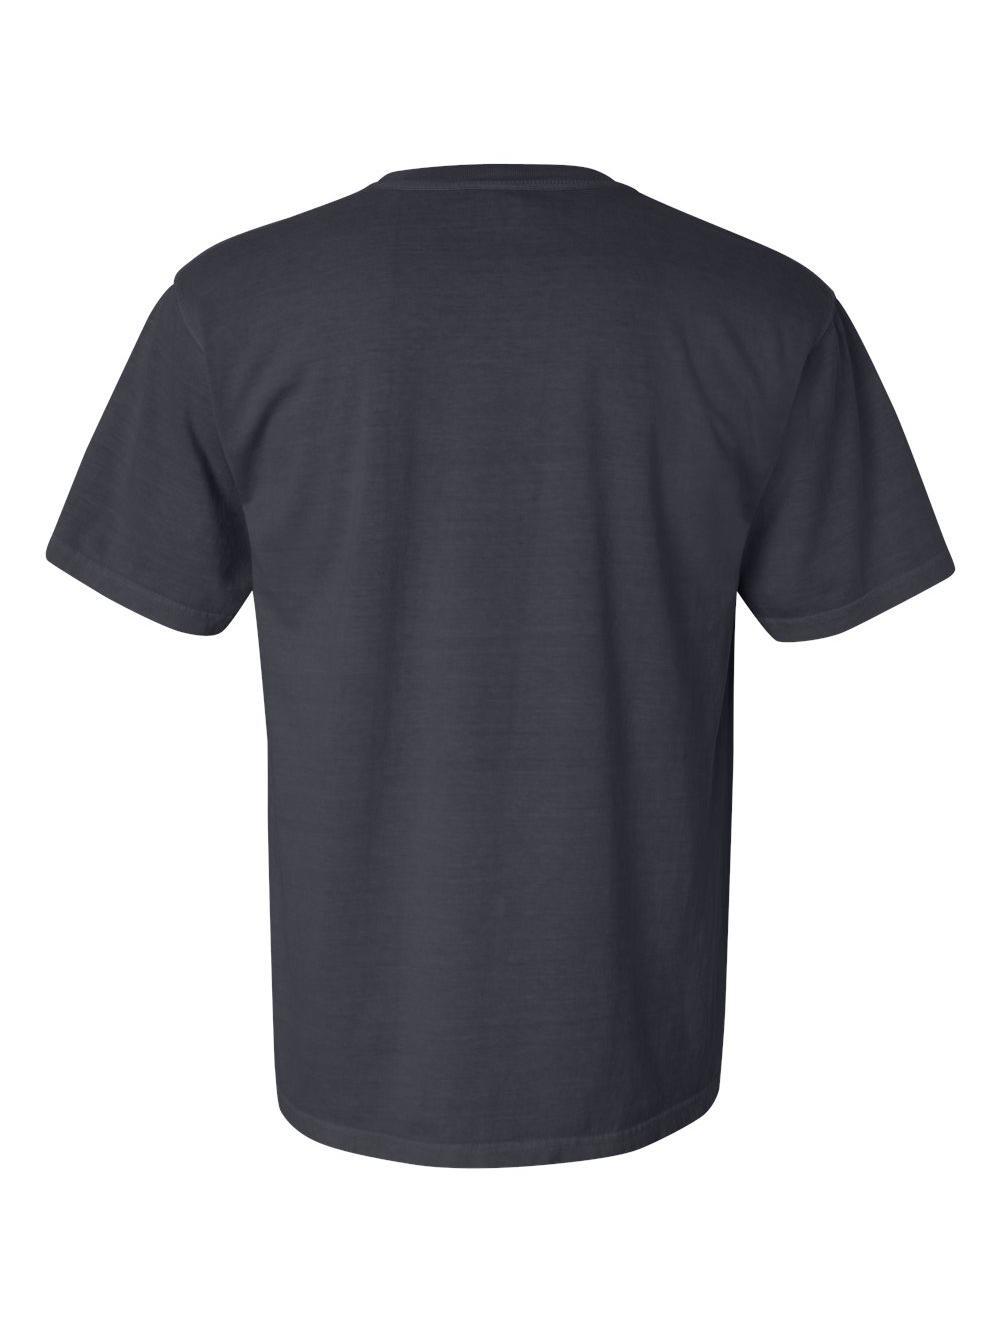 Comfort-Colors-Garment-Dyed-Heavyweight-Ringspun-Short-Sleeve-Shirt-1717 thumbnail 55